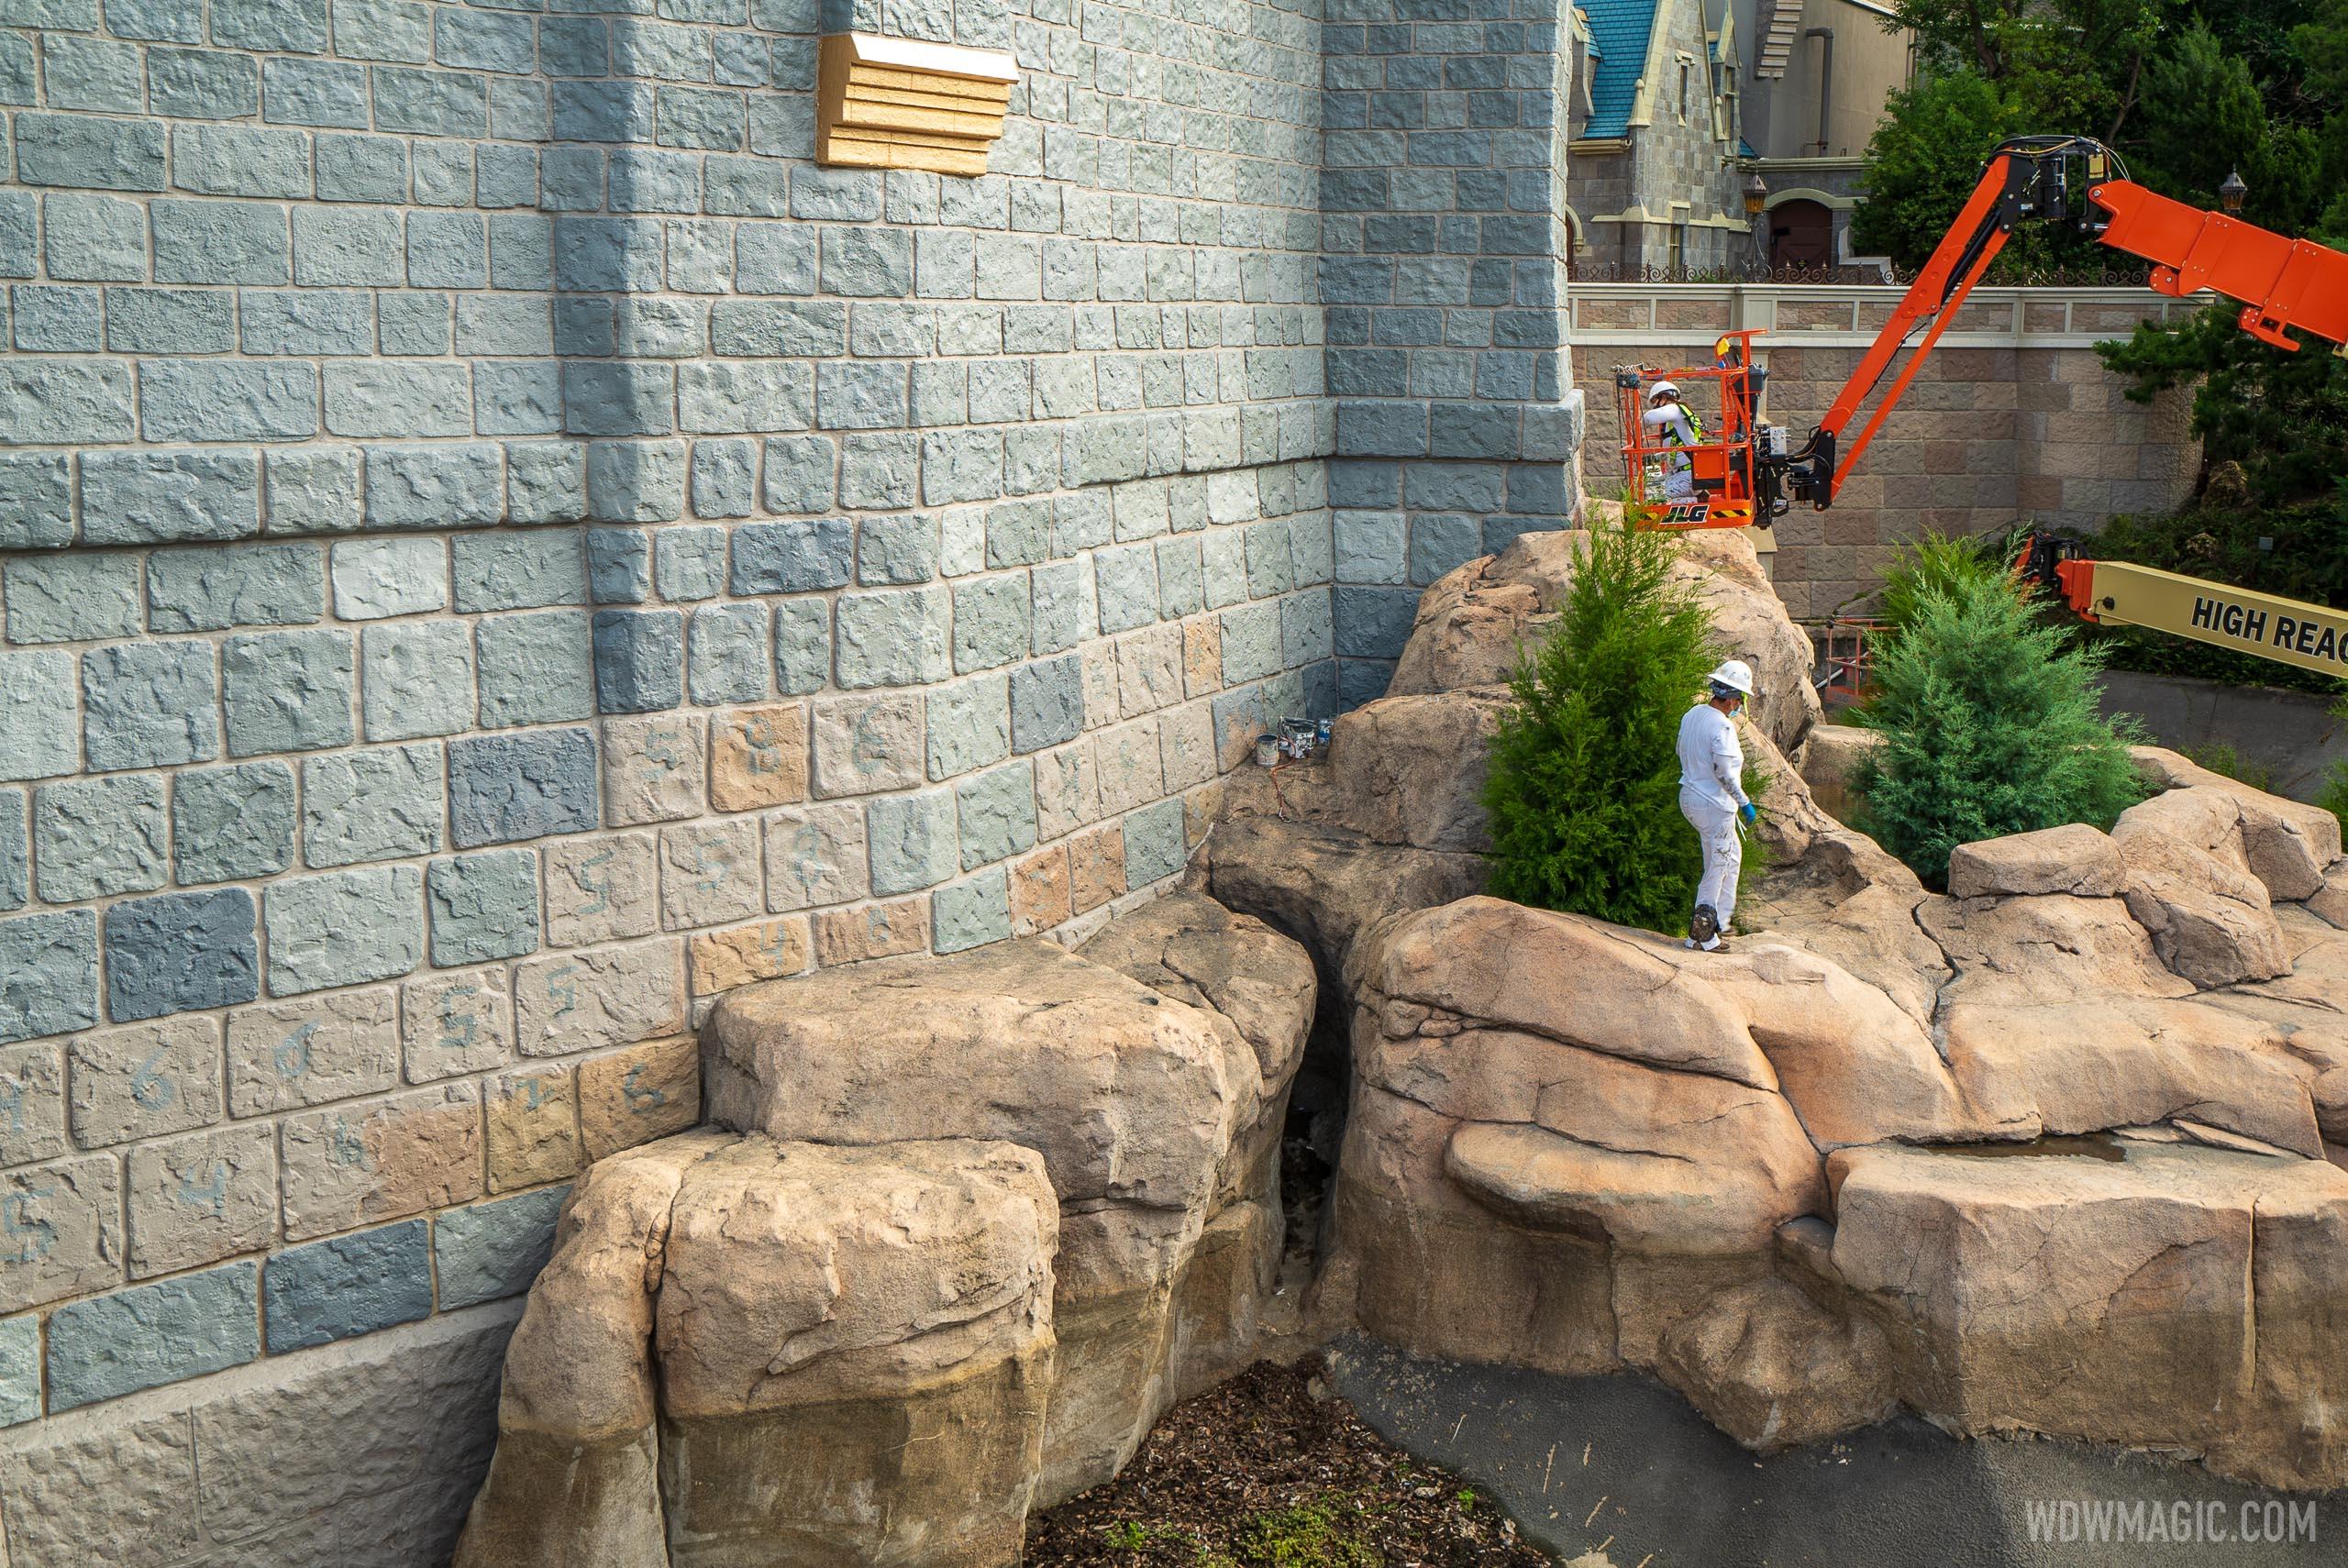 Cinderella Castle repainting - July 21 2020